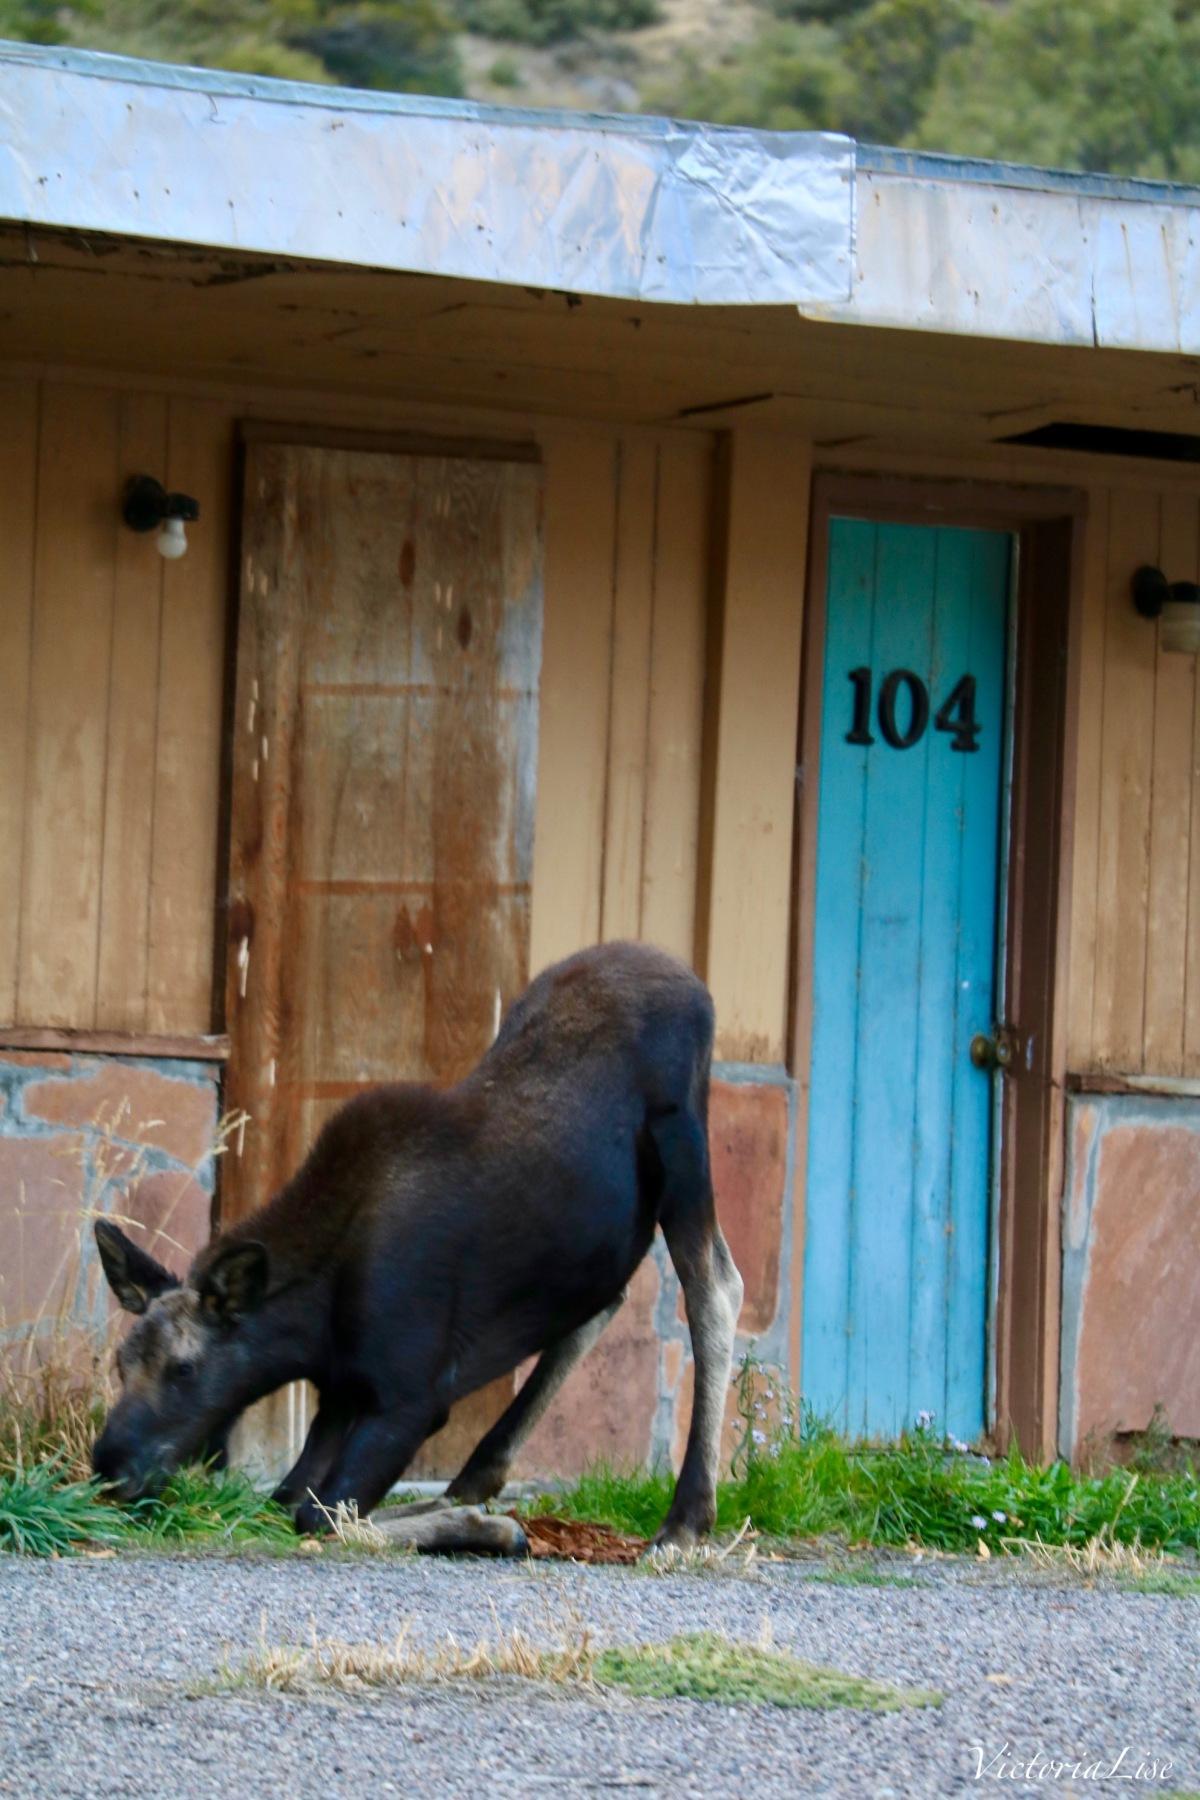 Moose brunching on grass, bottoms up! ©Victoria Lise 2018.